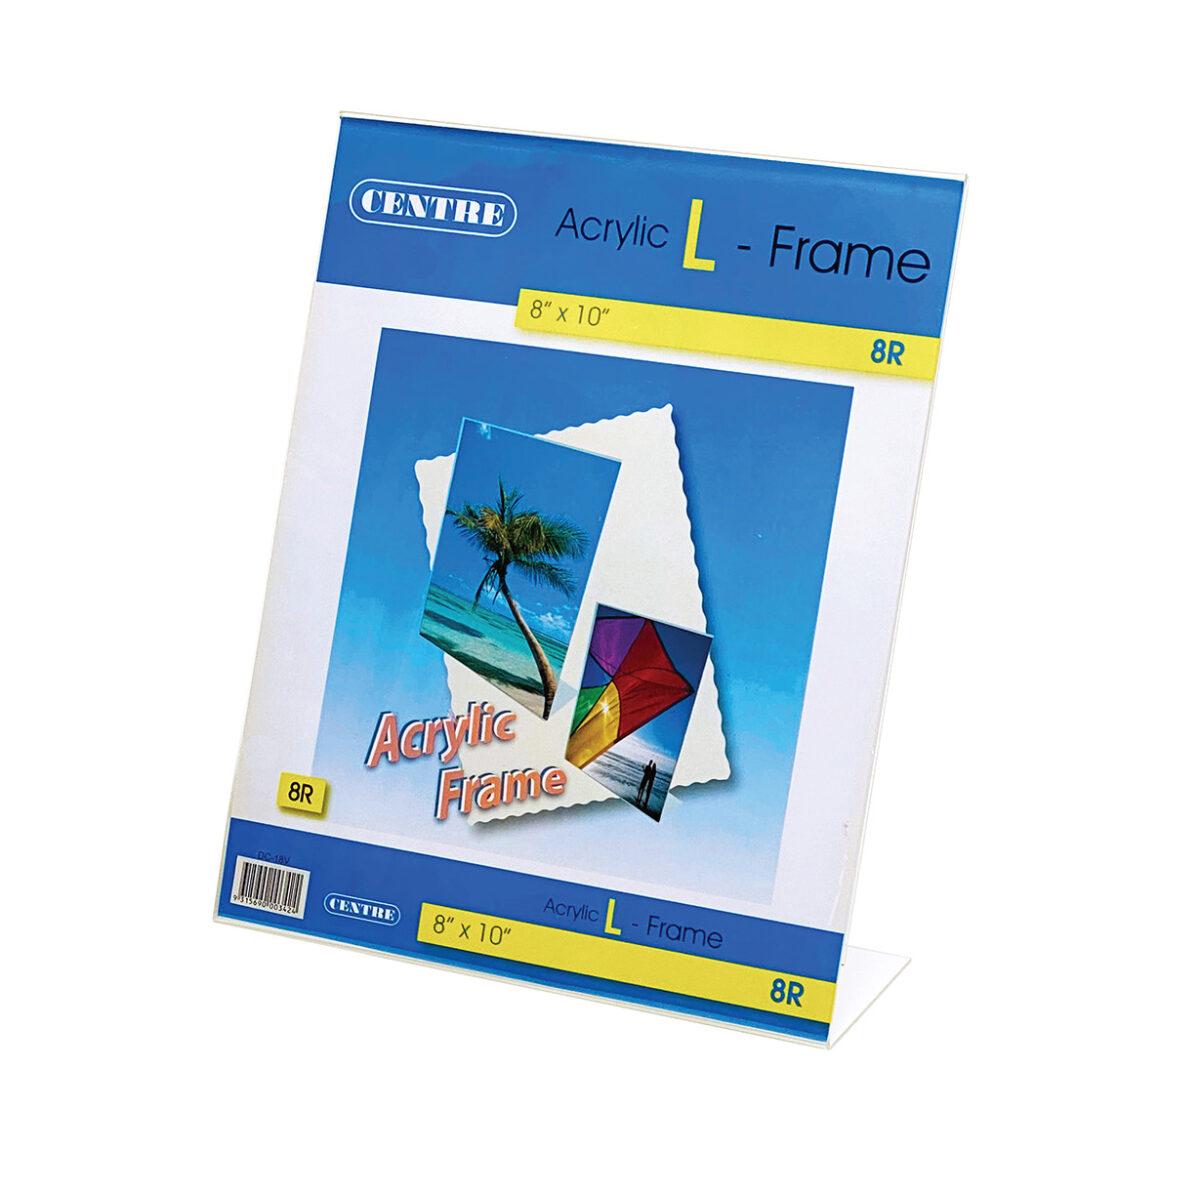 Centre Acrylic Picture Frame - L Stand Portrait 8R